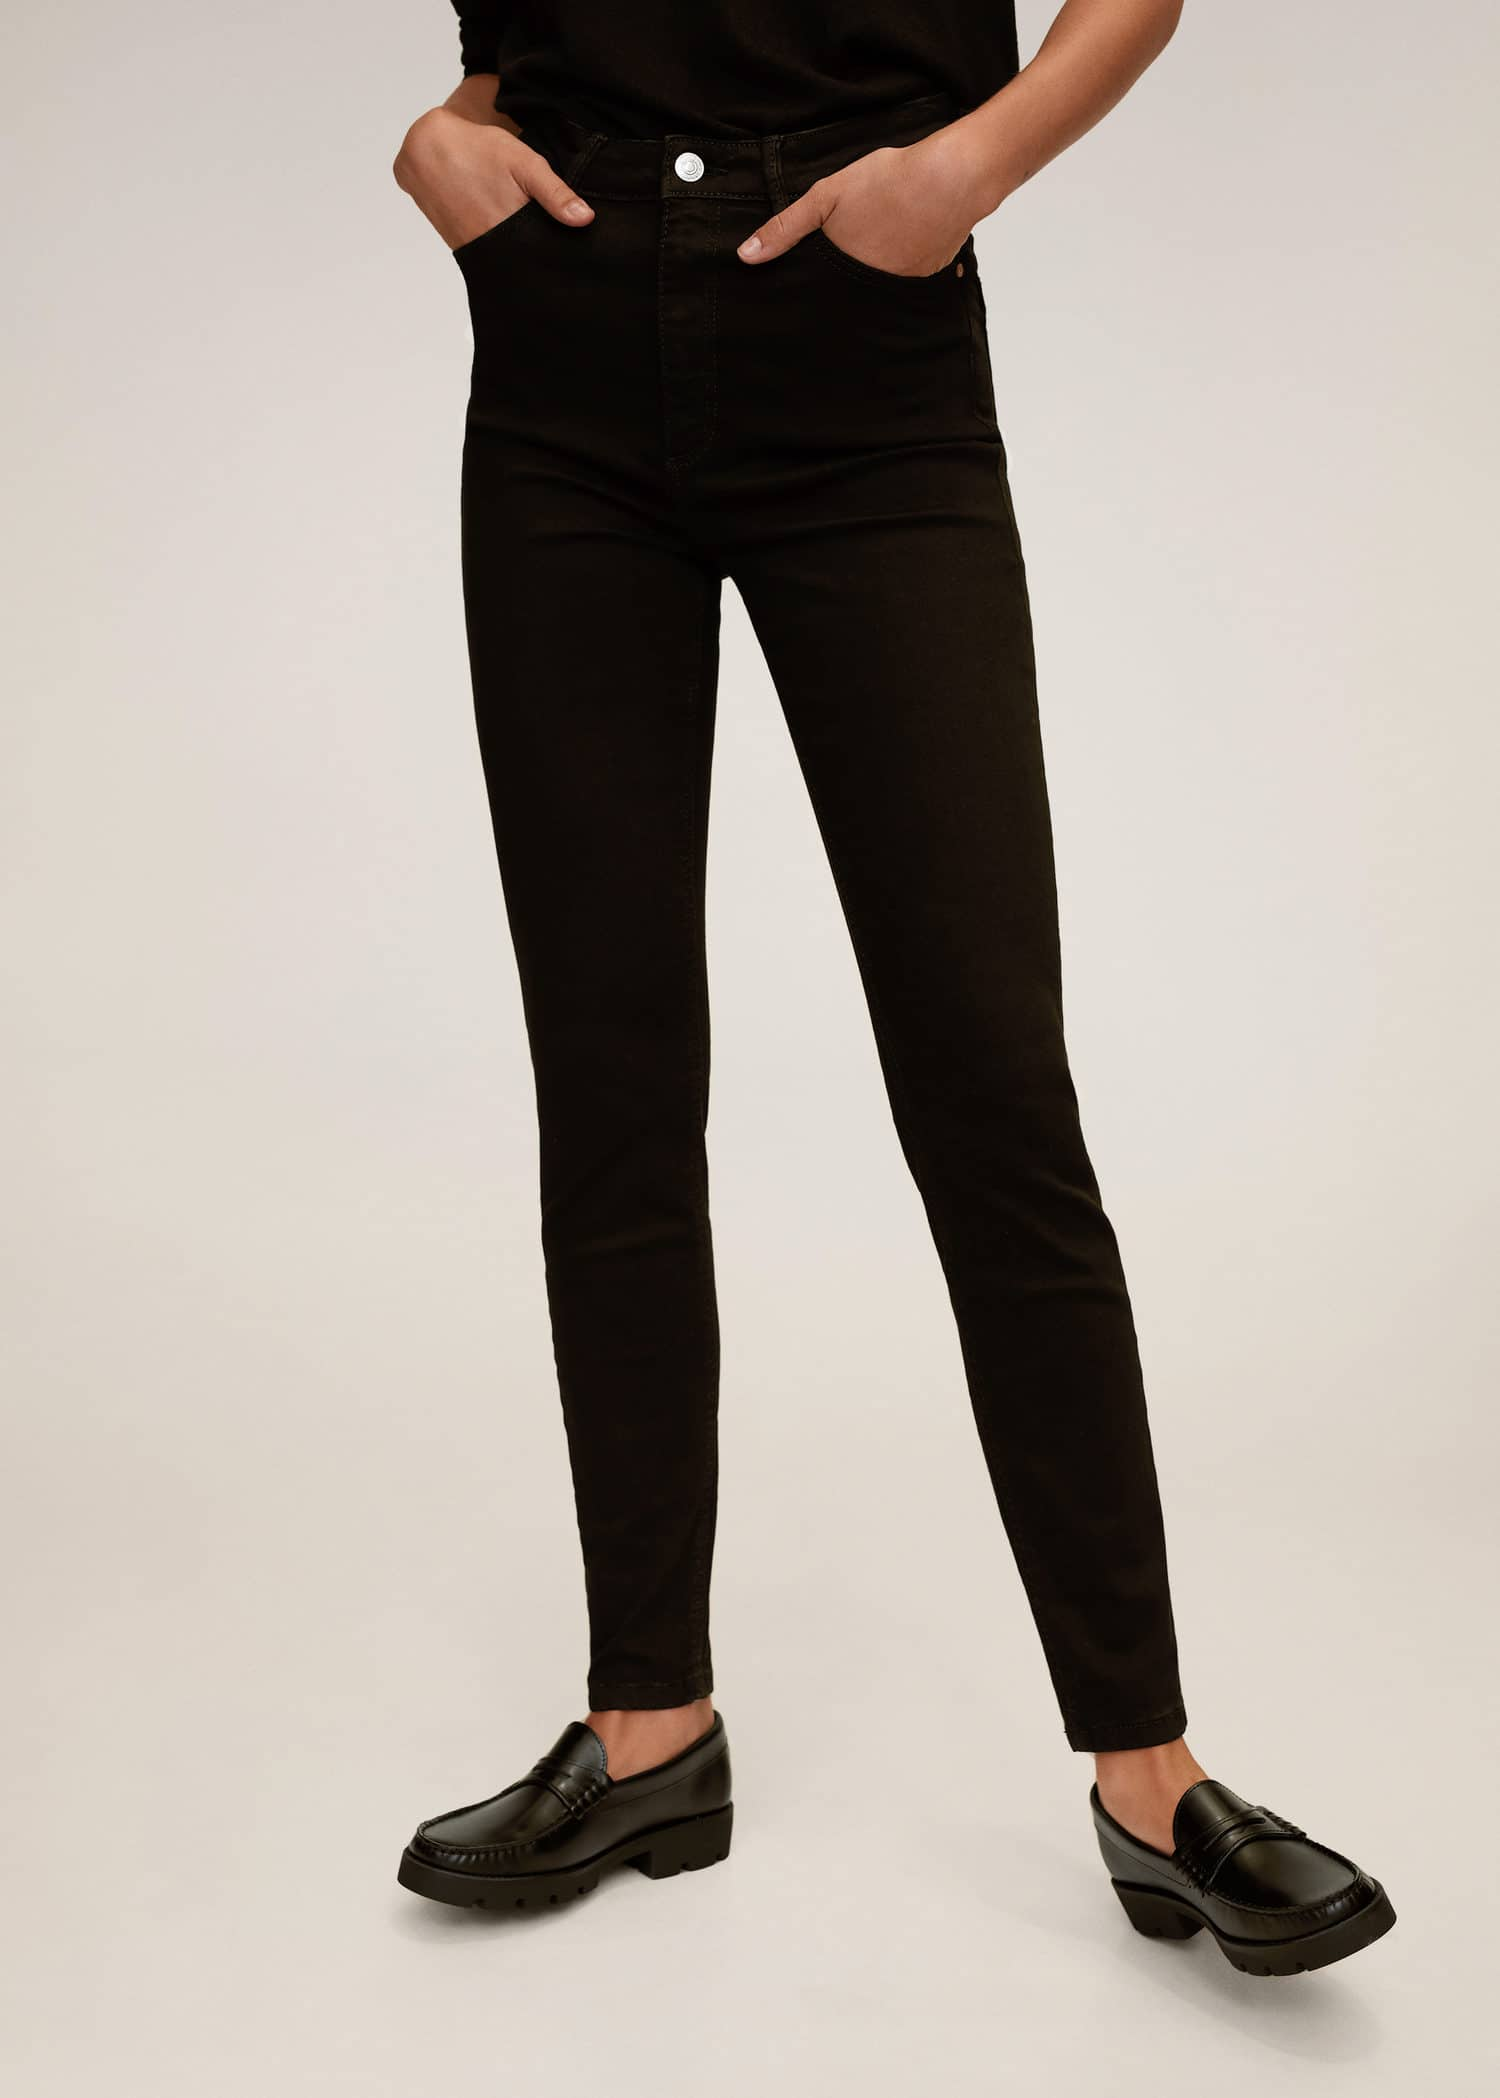 mango pantalon femme noir noa